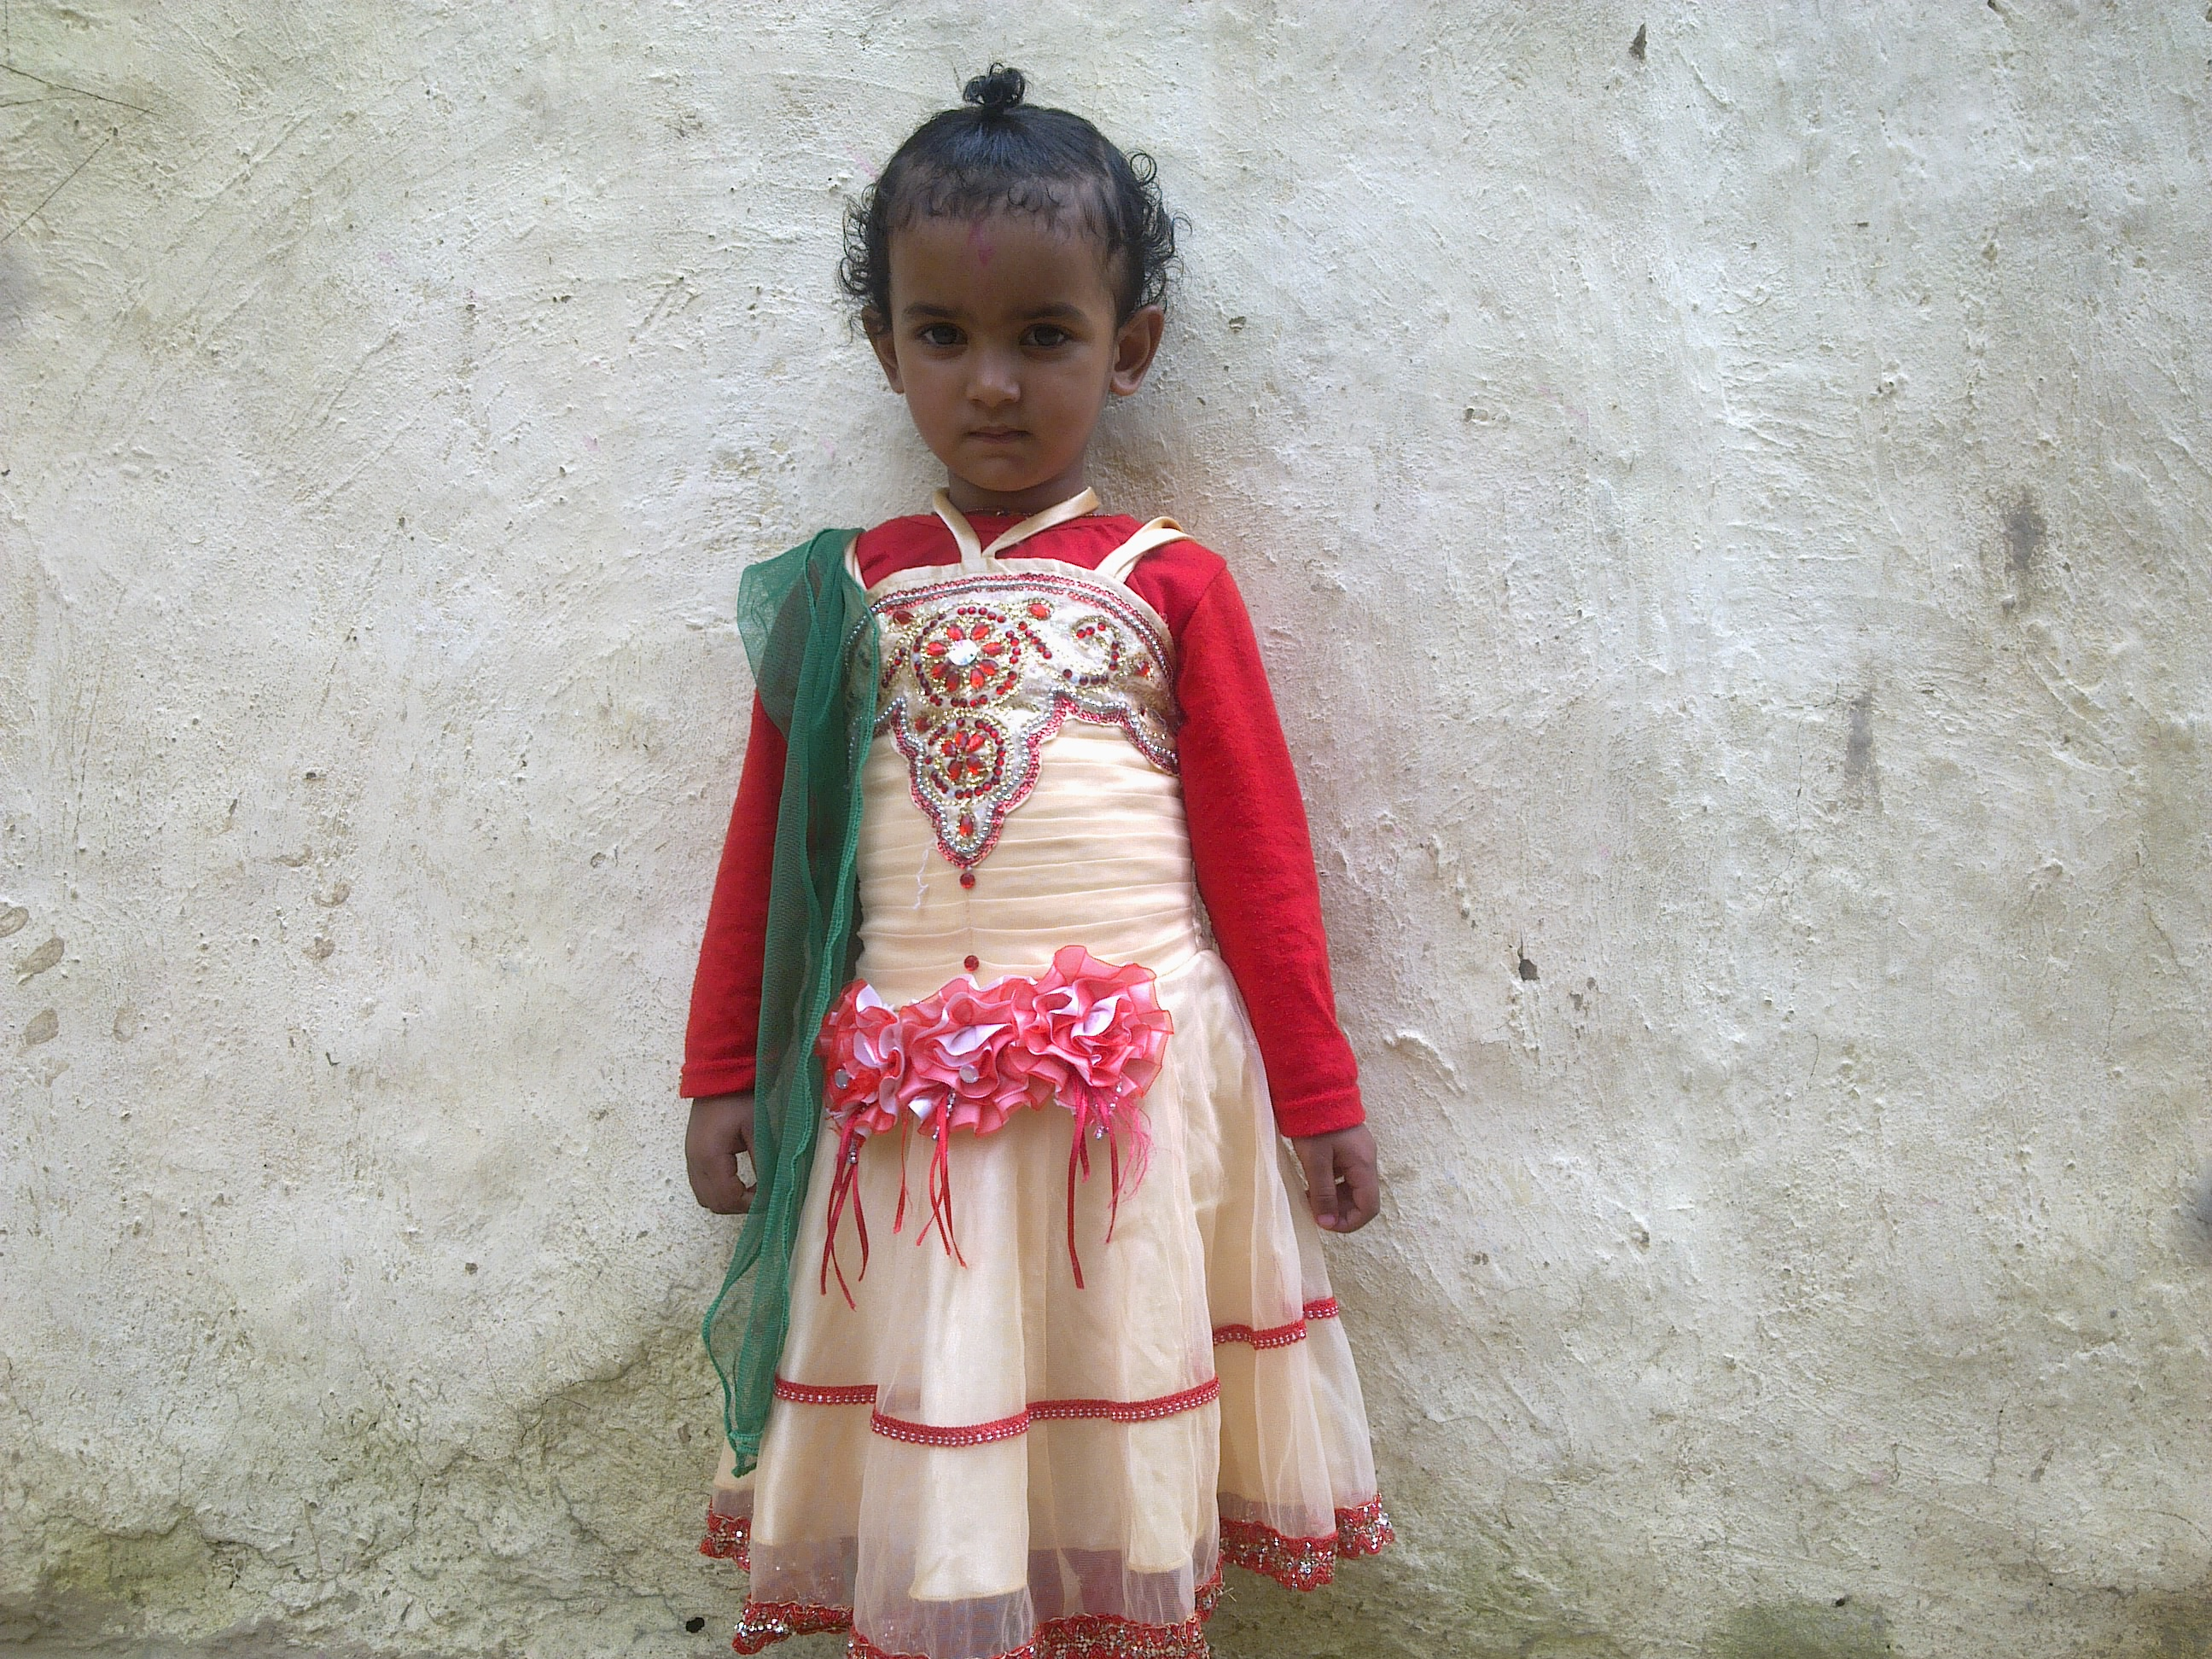 free photo cute baby girl india girl cute free download jooinn